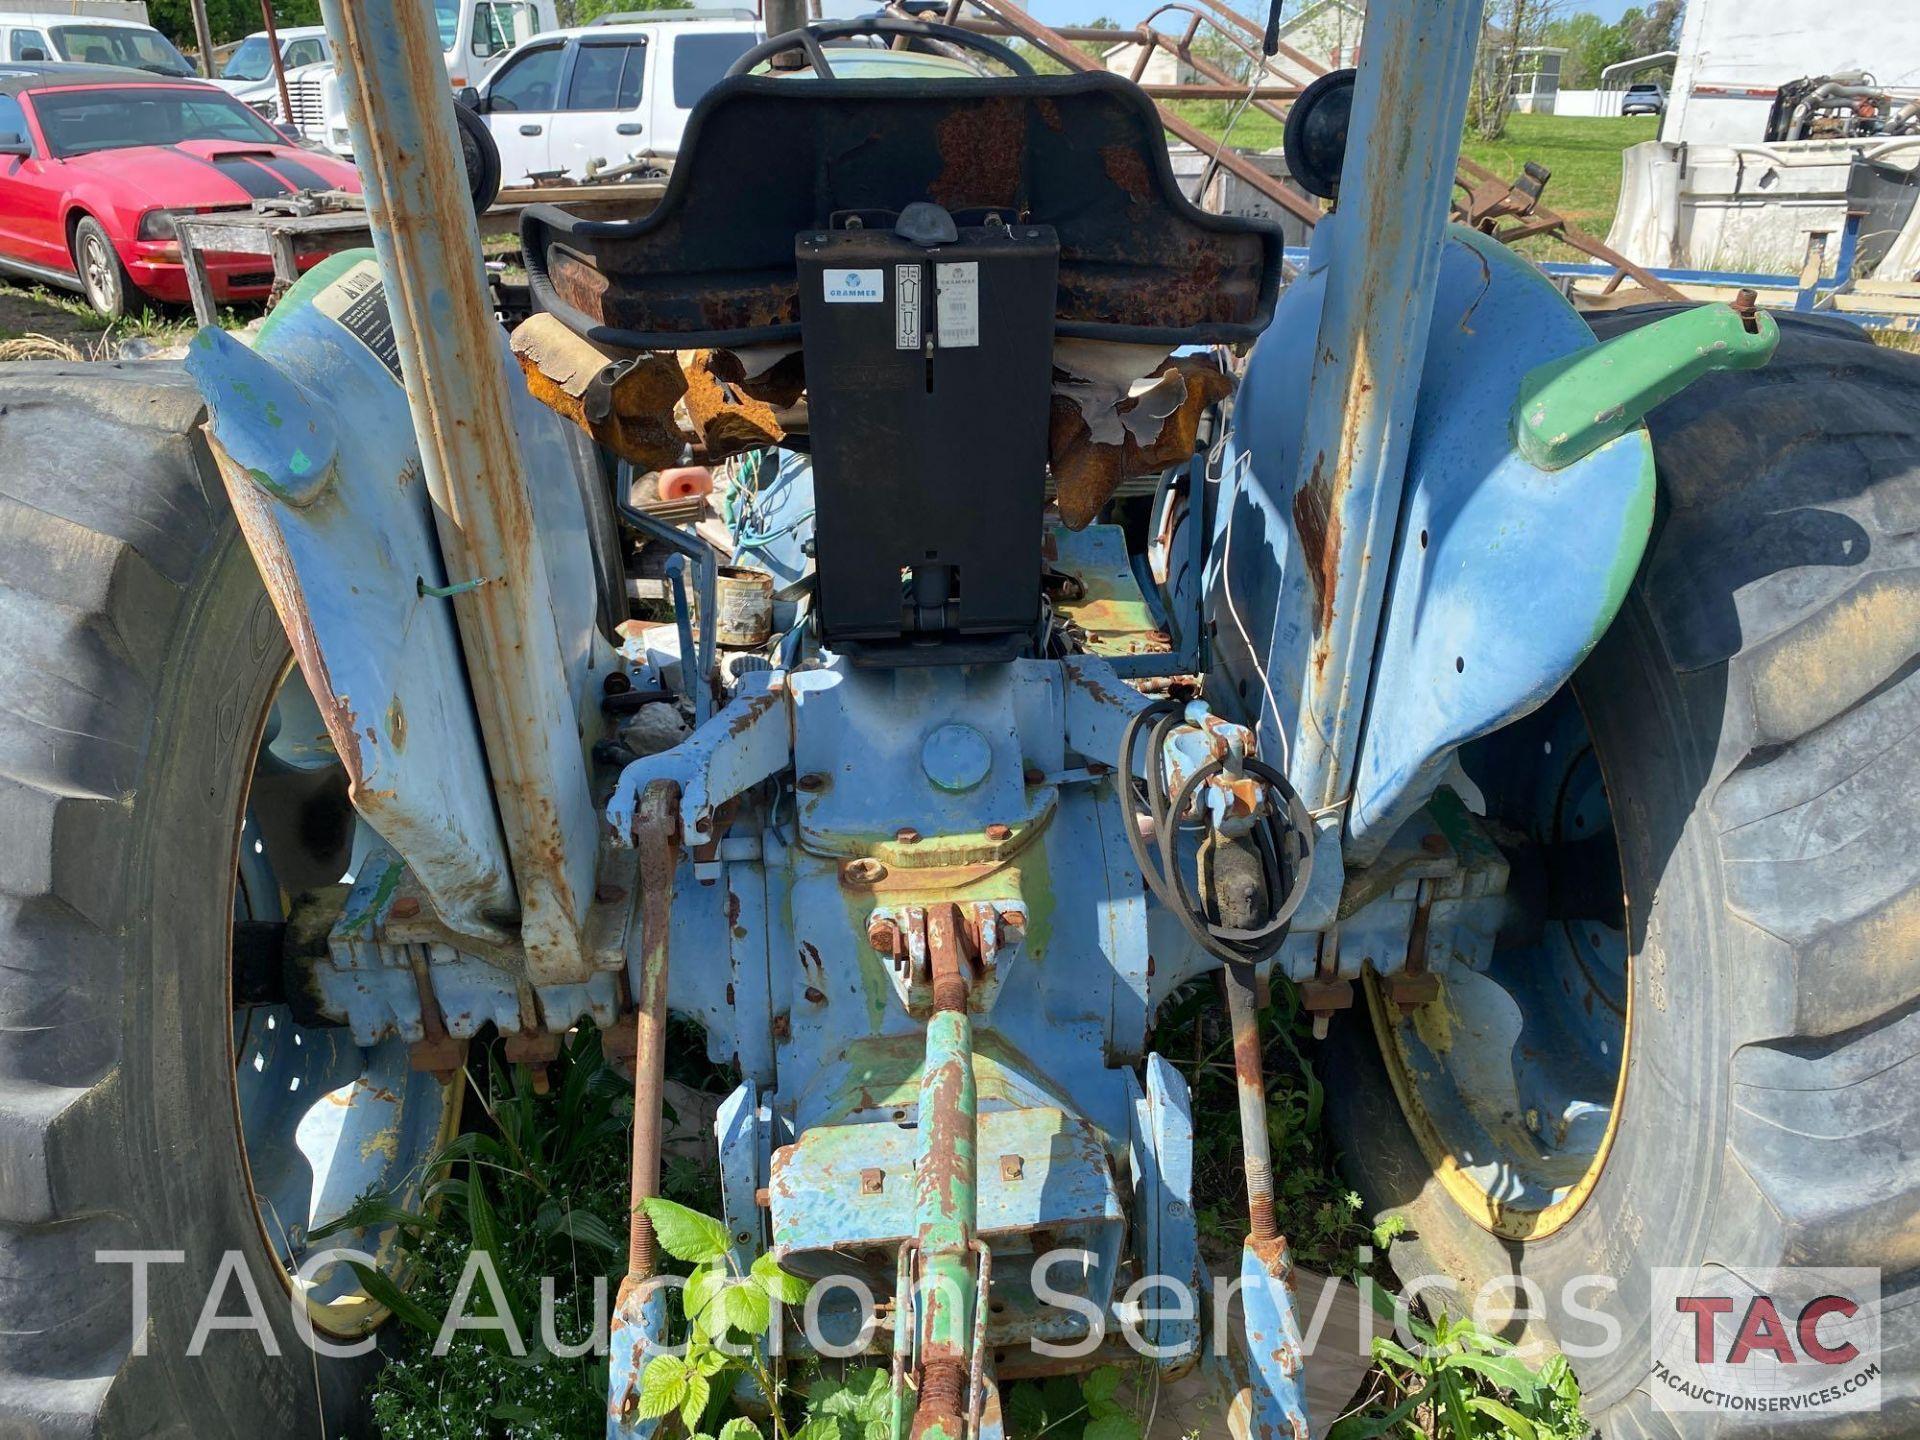 John Deere 2150 Farm Tractor - Image 11 of 34